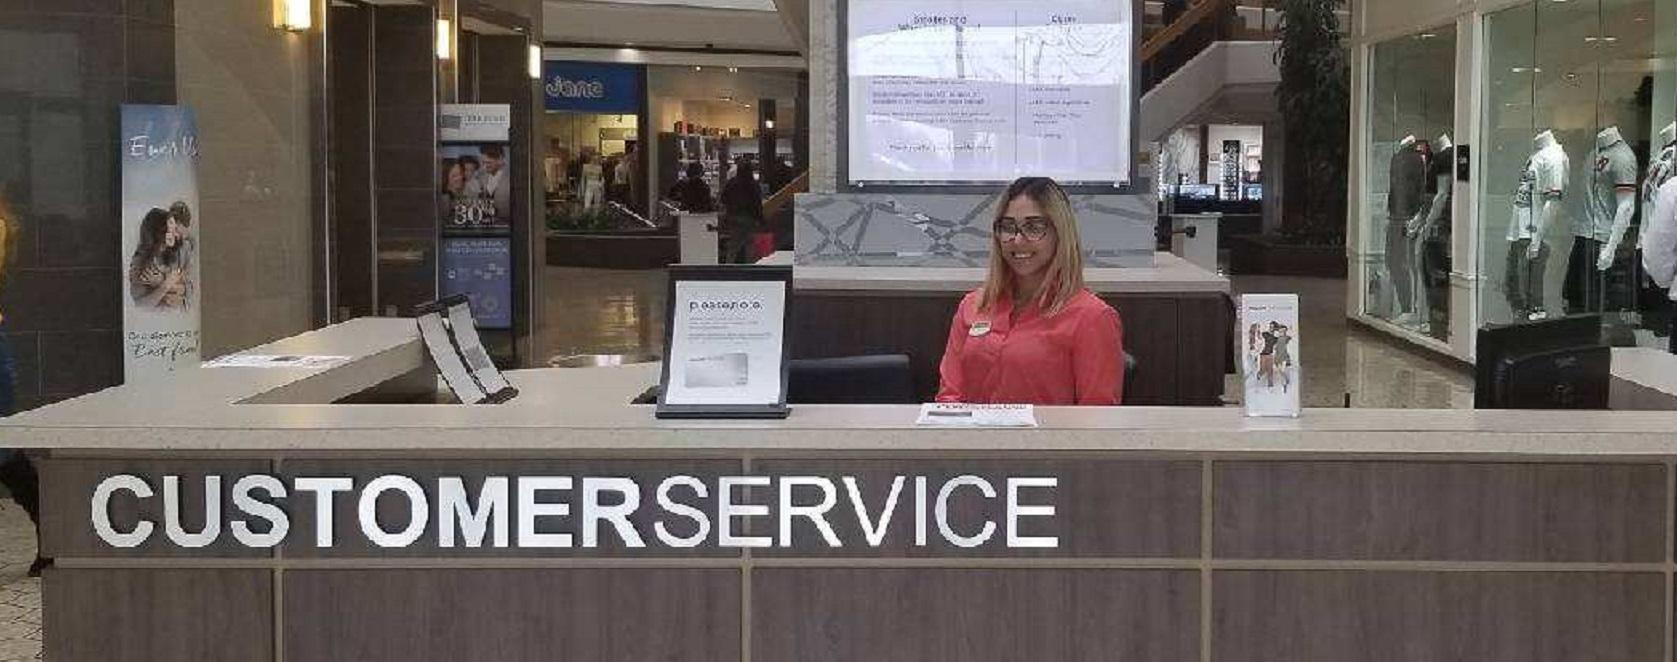 Customer Service Booth